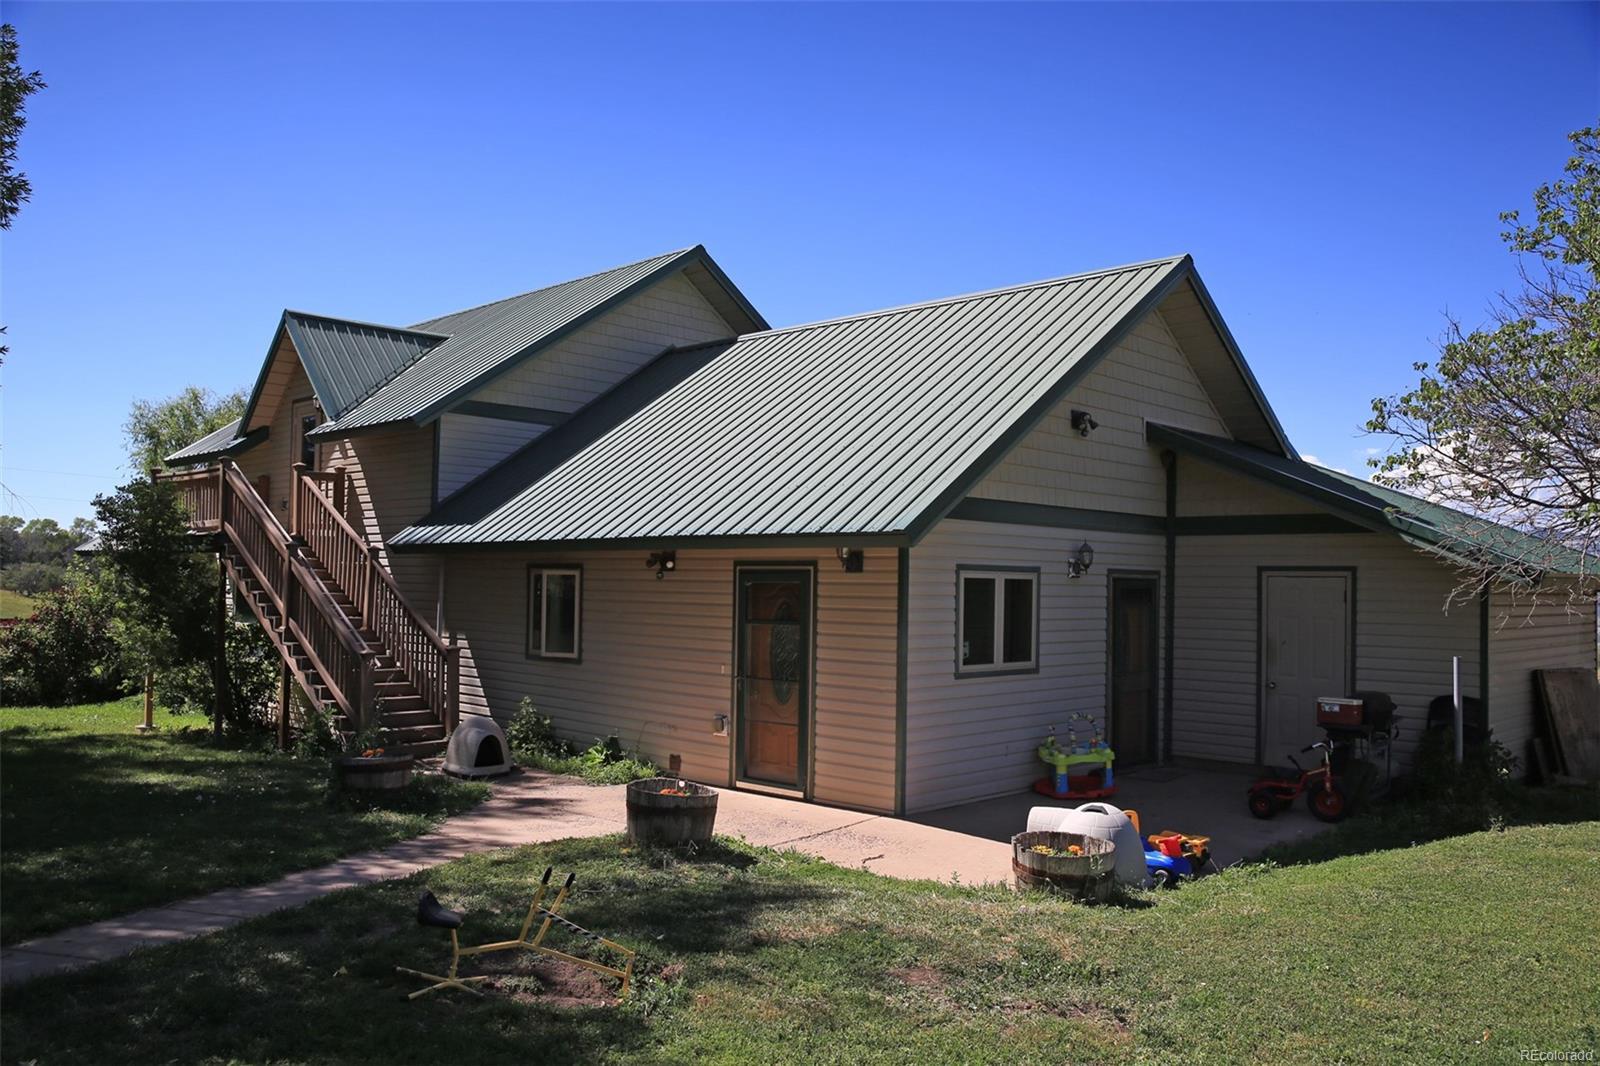 12444 58 Road, Collbran, CO 81624 - Collbran, CO real estate listing